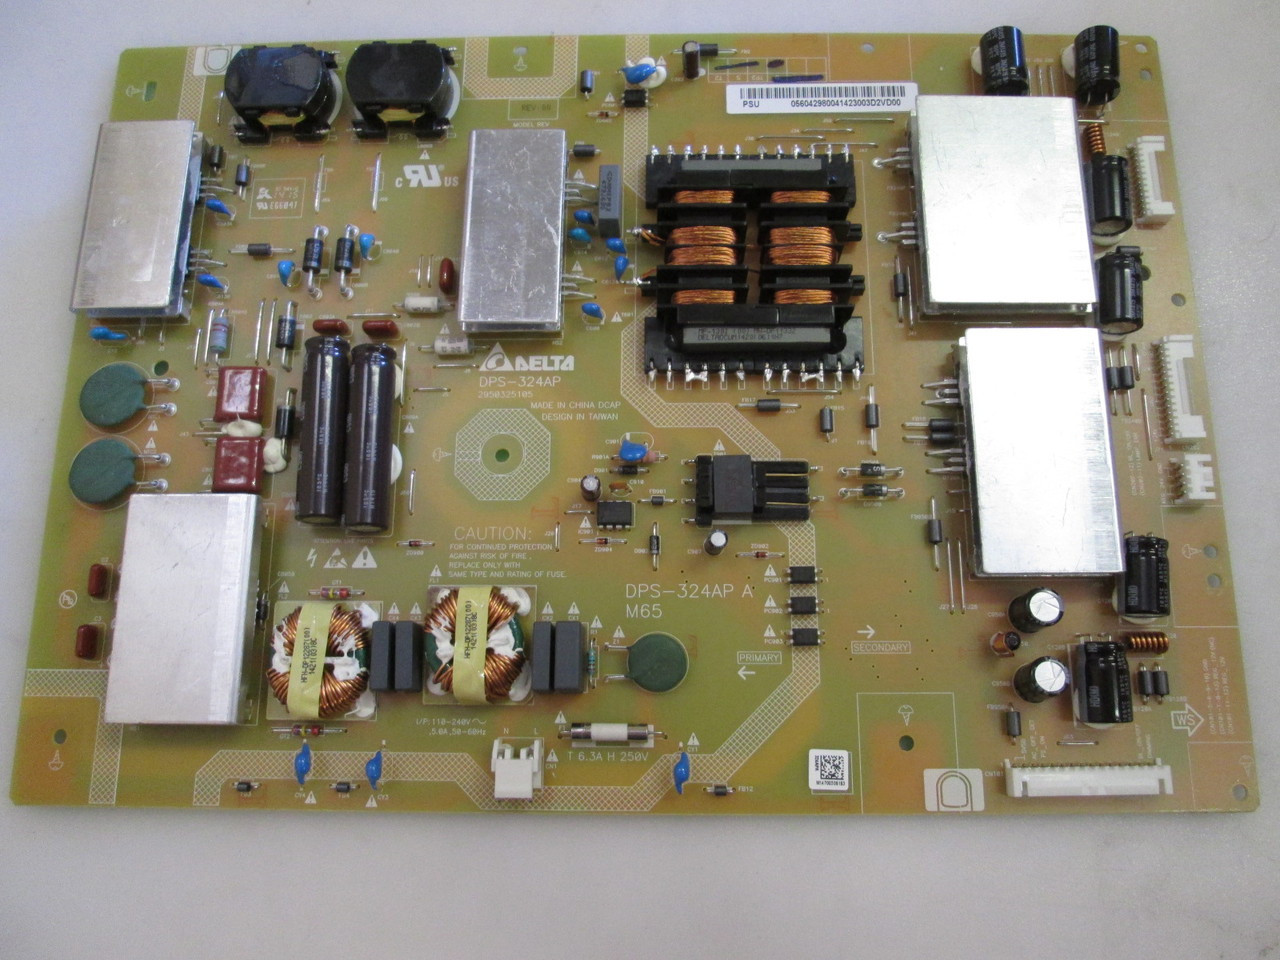 VIZIO M652I-B2 POWER SUPPLY 056 04298 0041 , tv parts , DPS-324AP